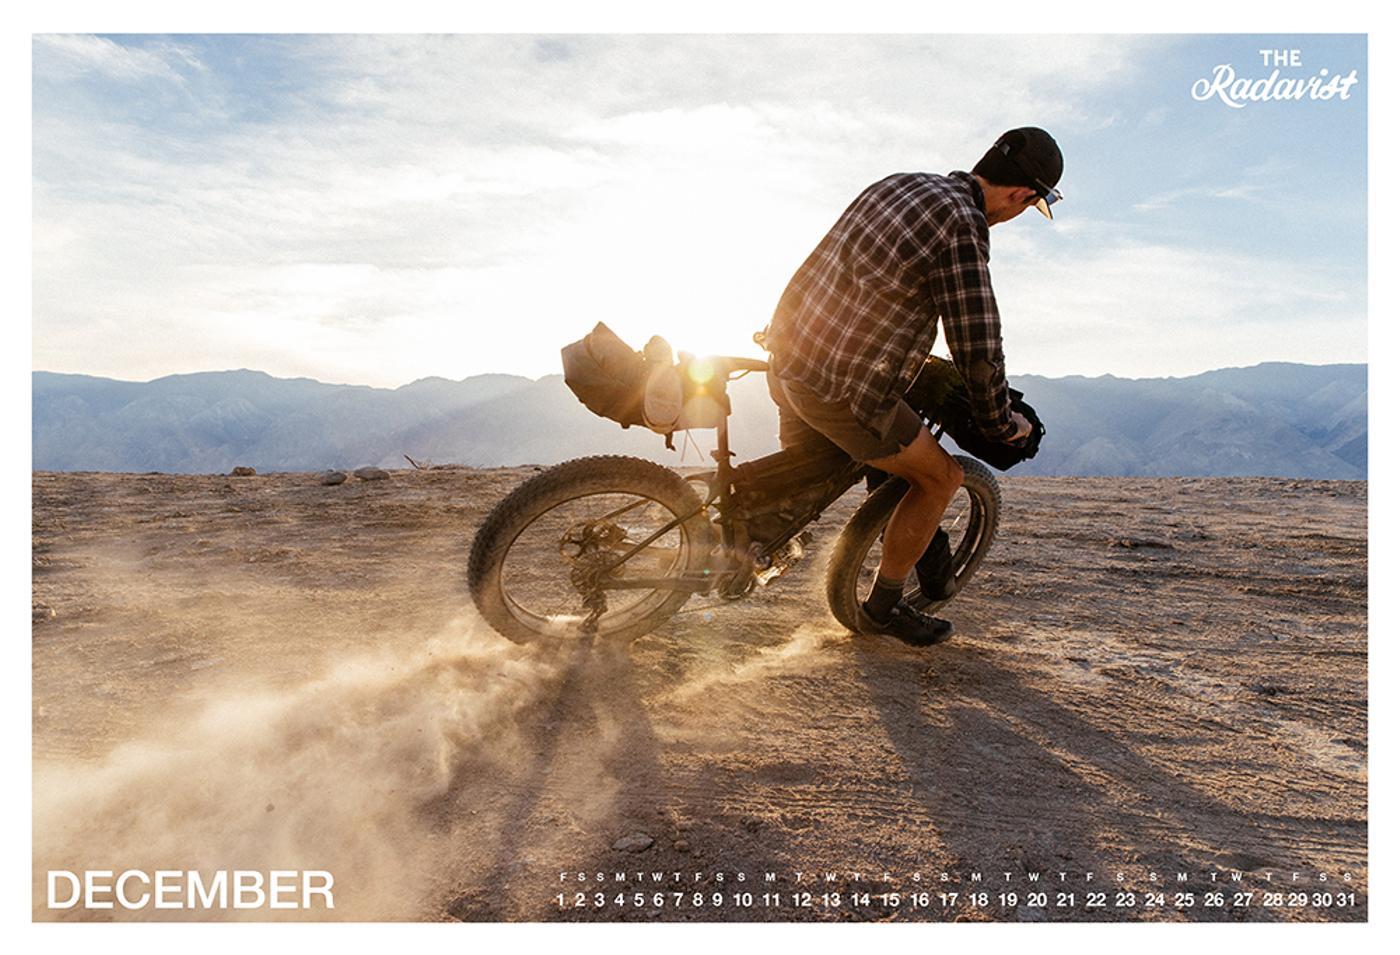 The Radavist 2017 Calendar: December